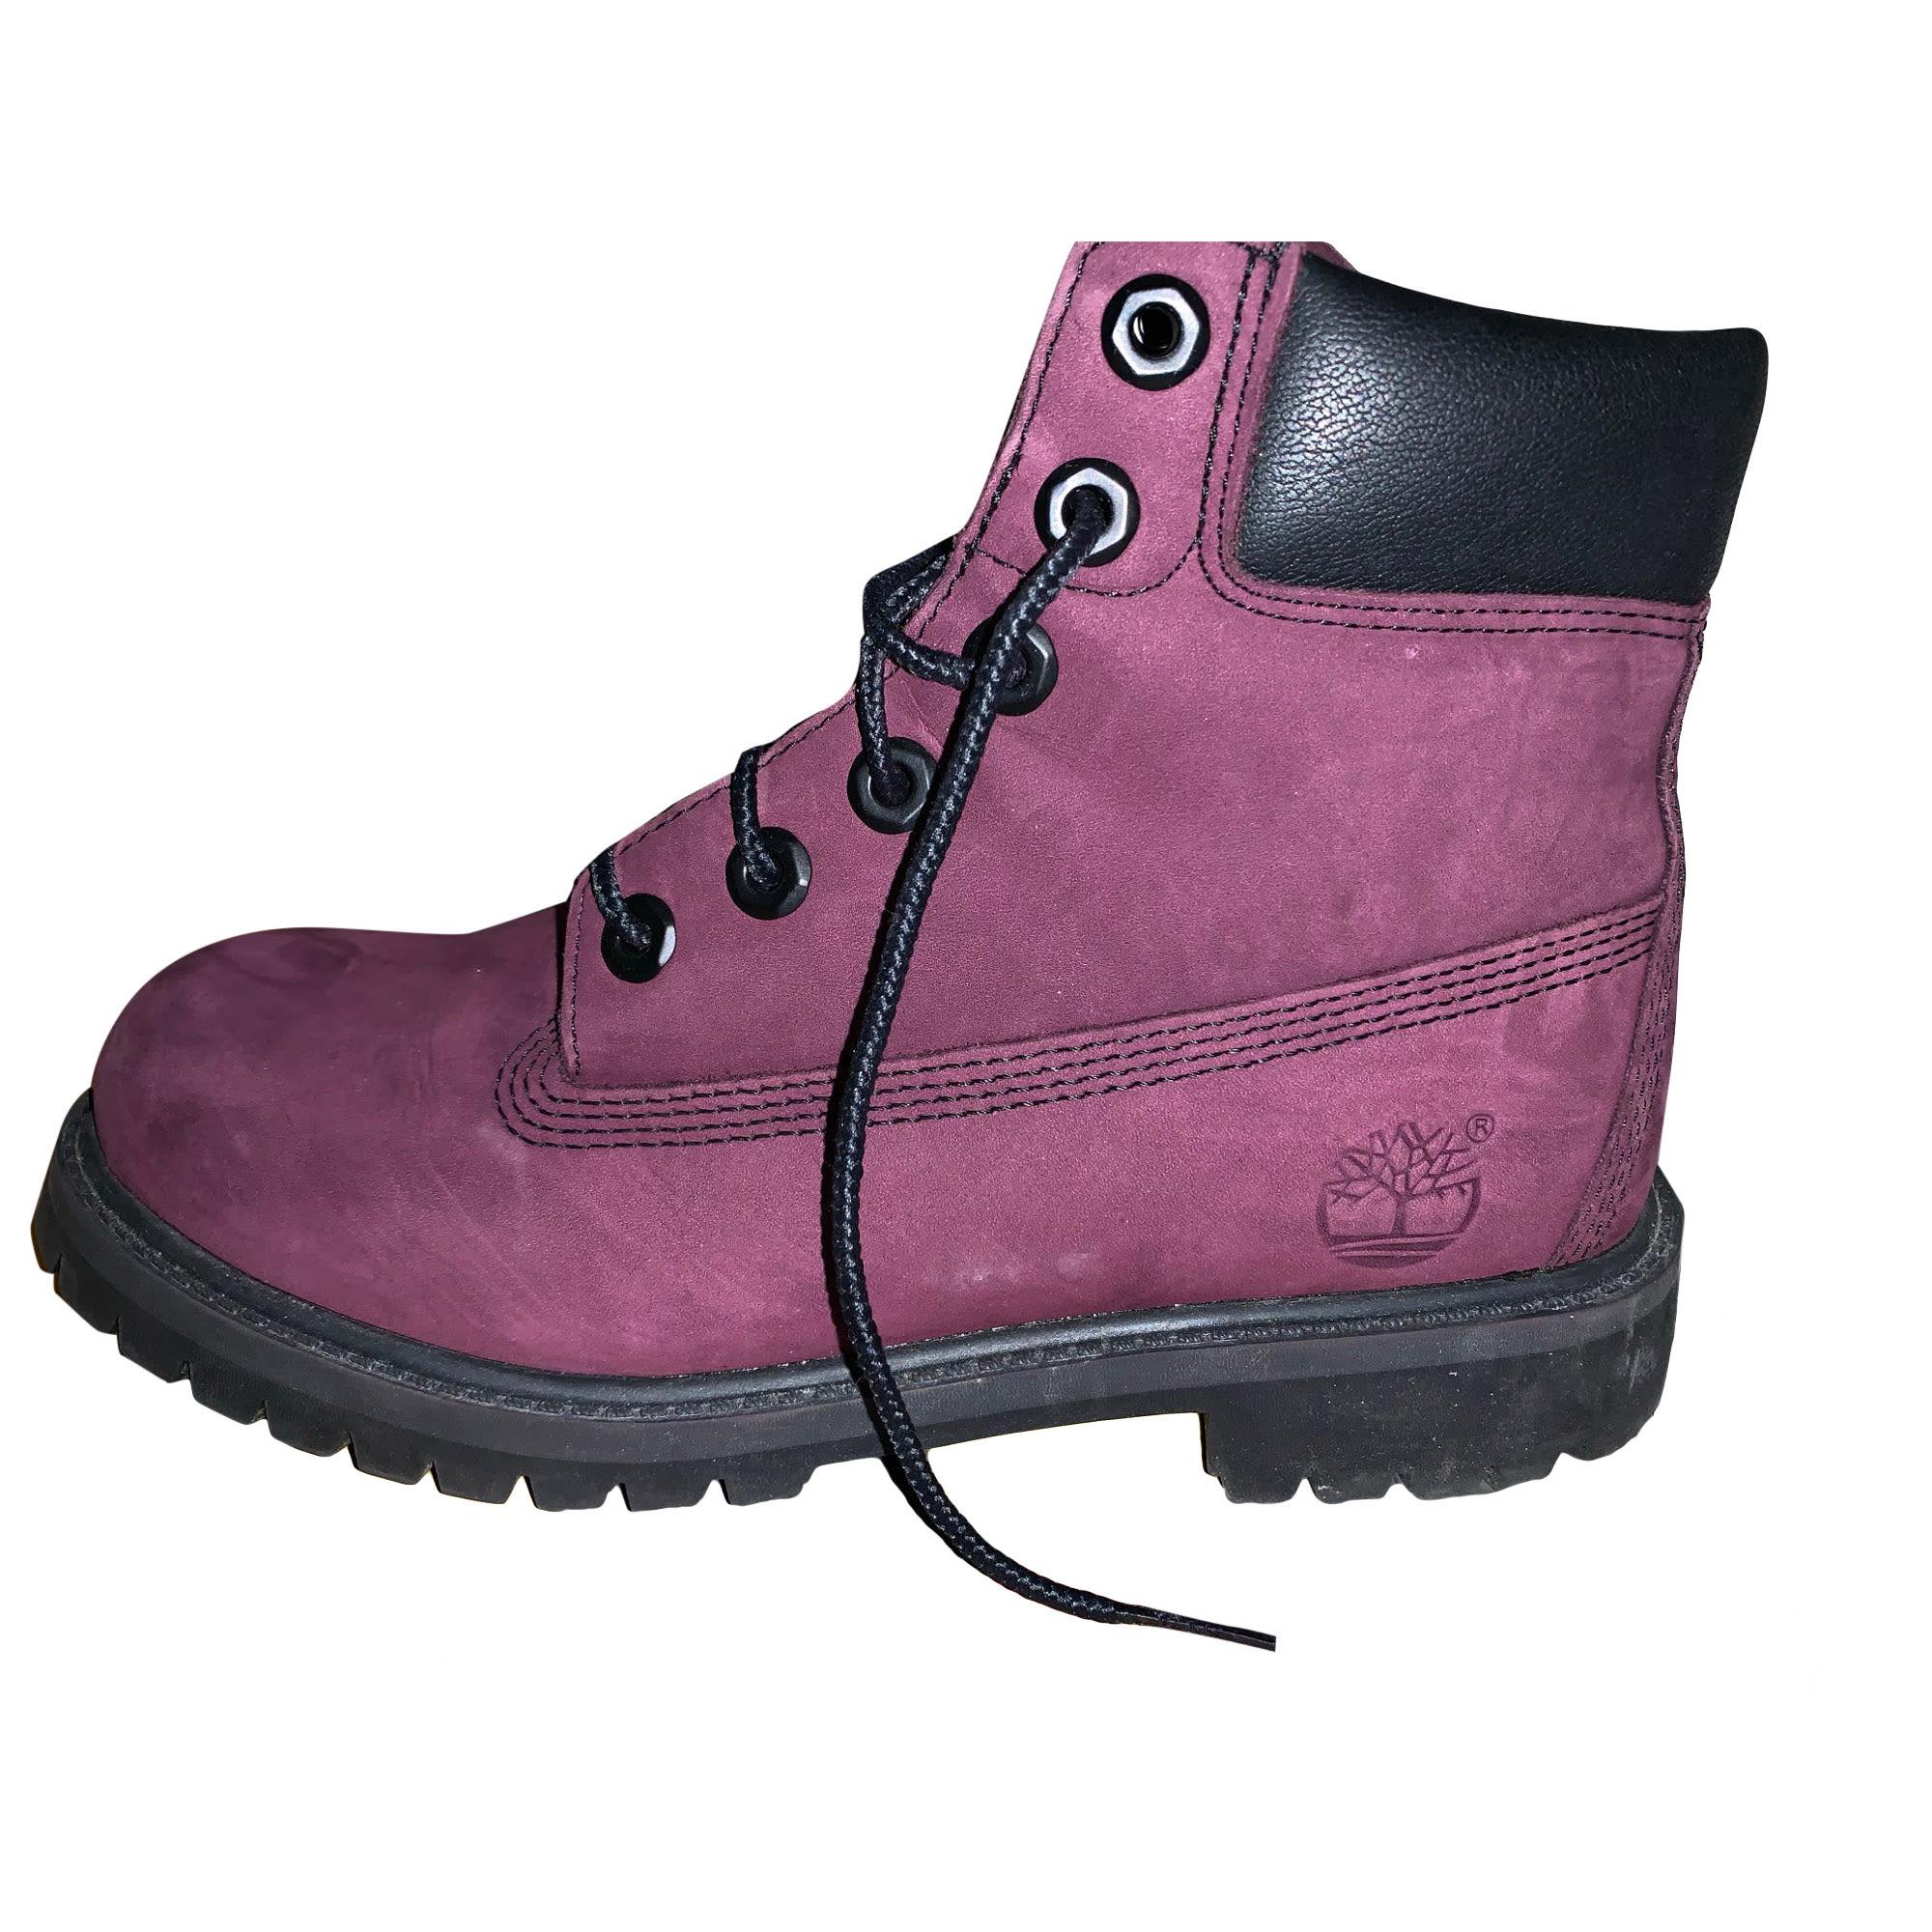 chaussure bottine femme timberland lavande